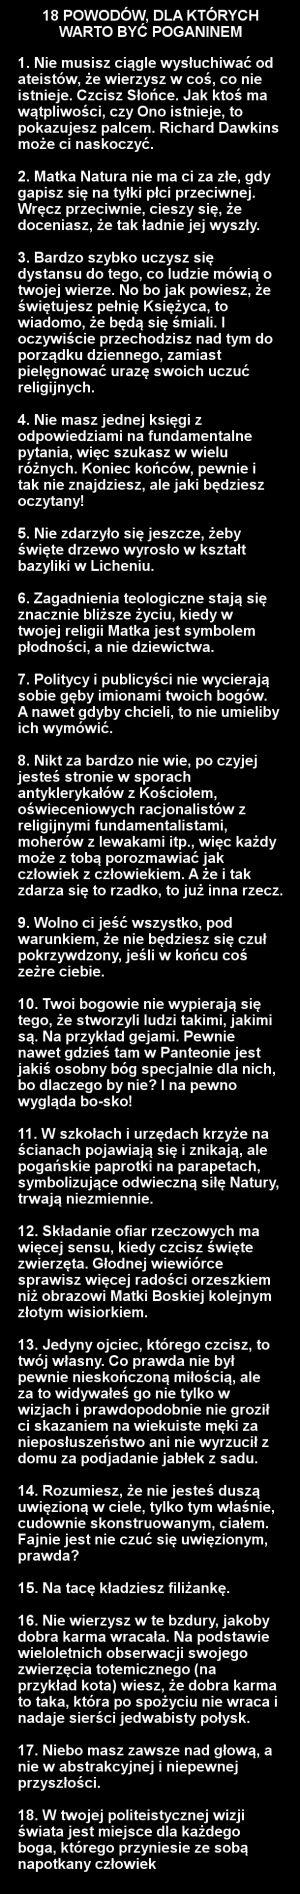 azbestowa_sowa